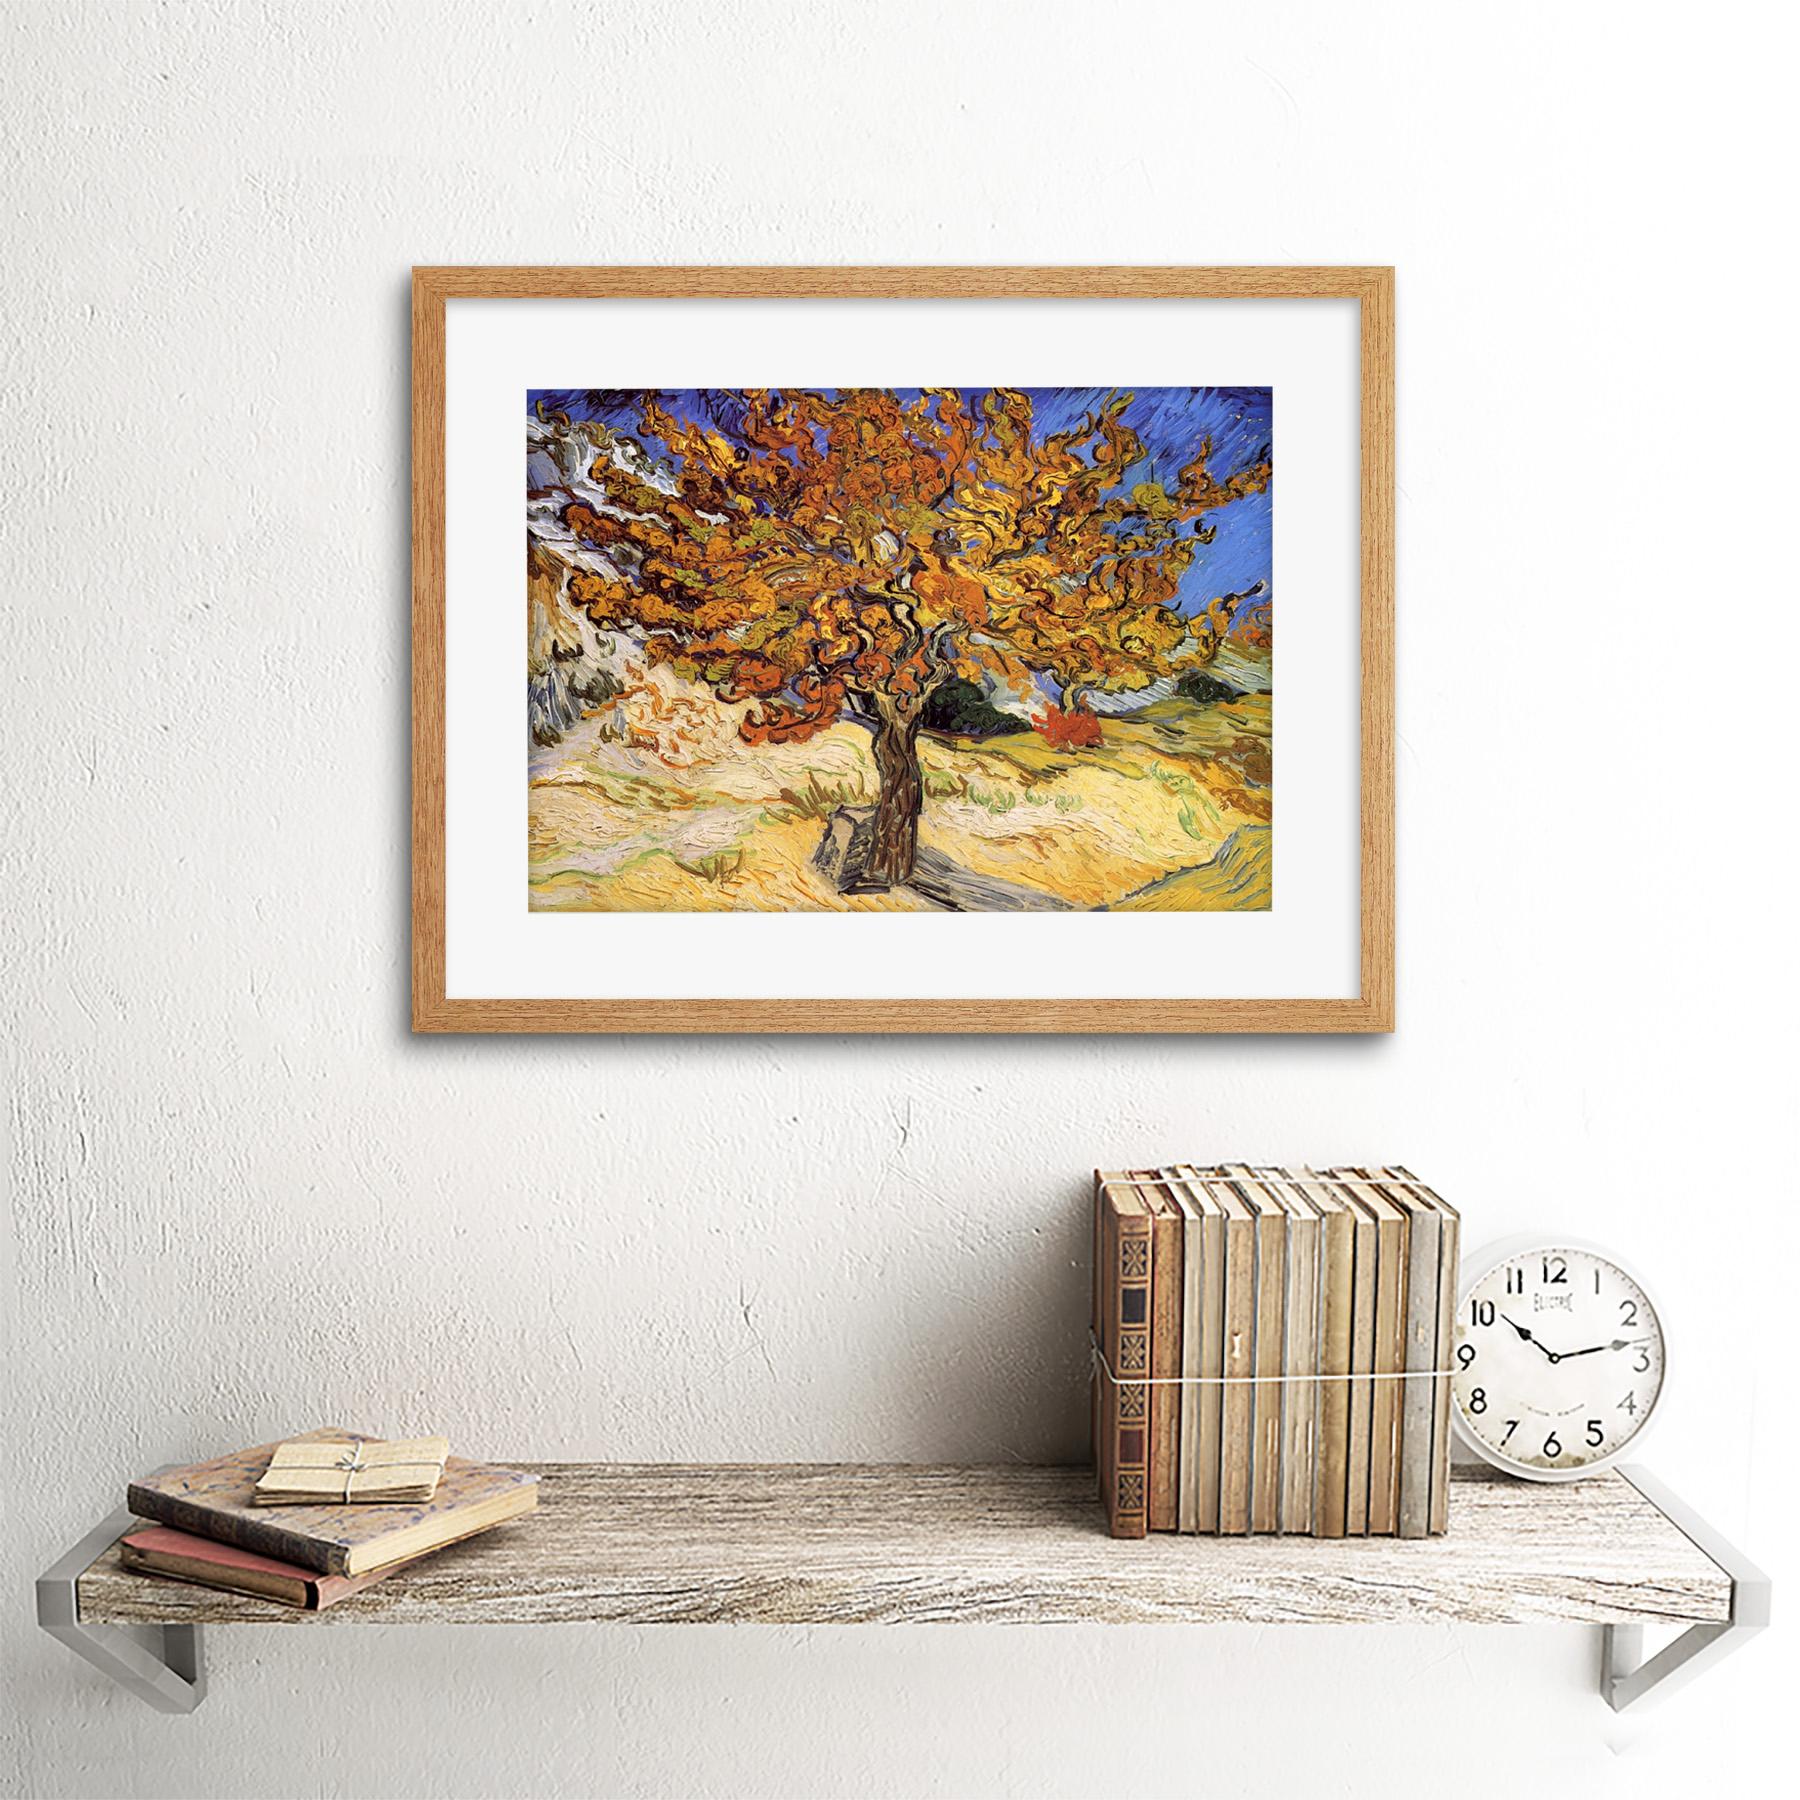 thumbnail 11 - Van-Gogh-Mulberry-Tree-1889-Old-Master-Framed-Wall-Art-Print